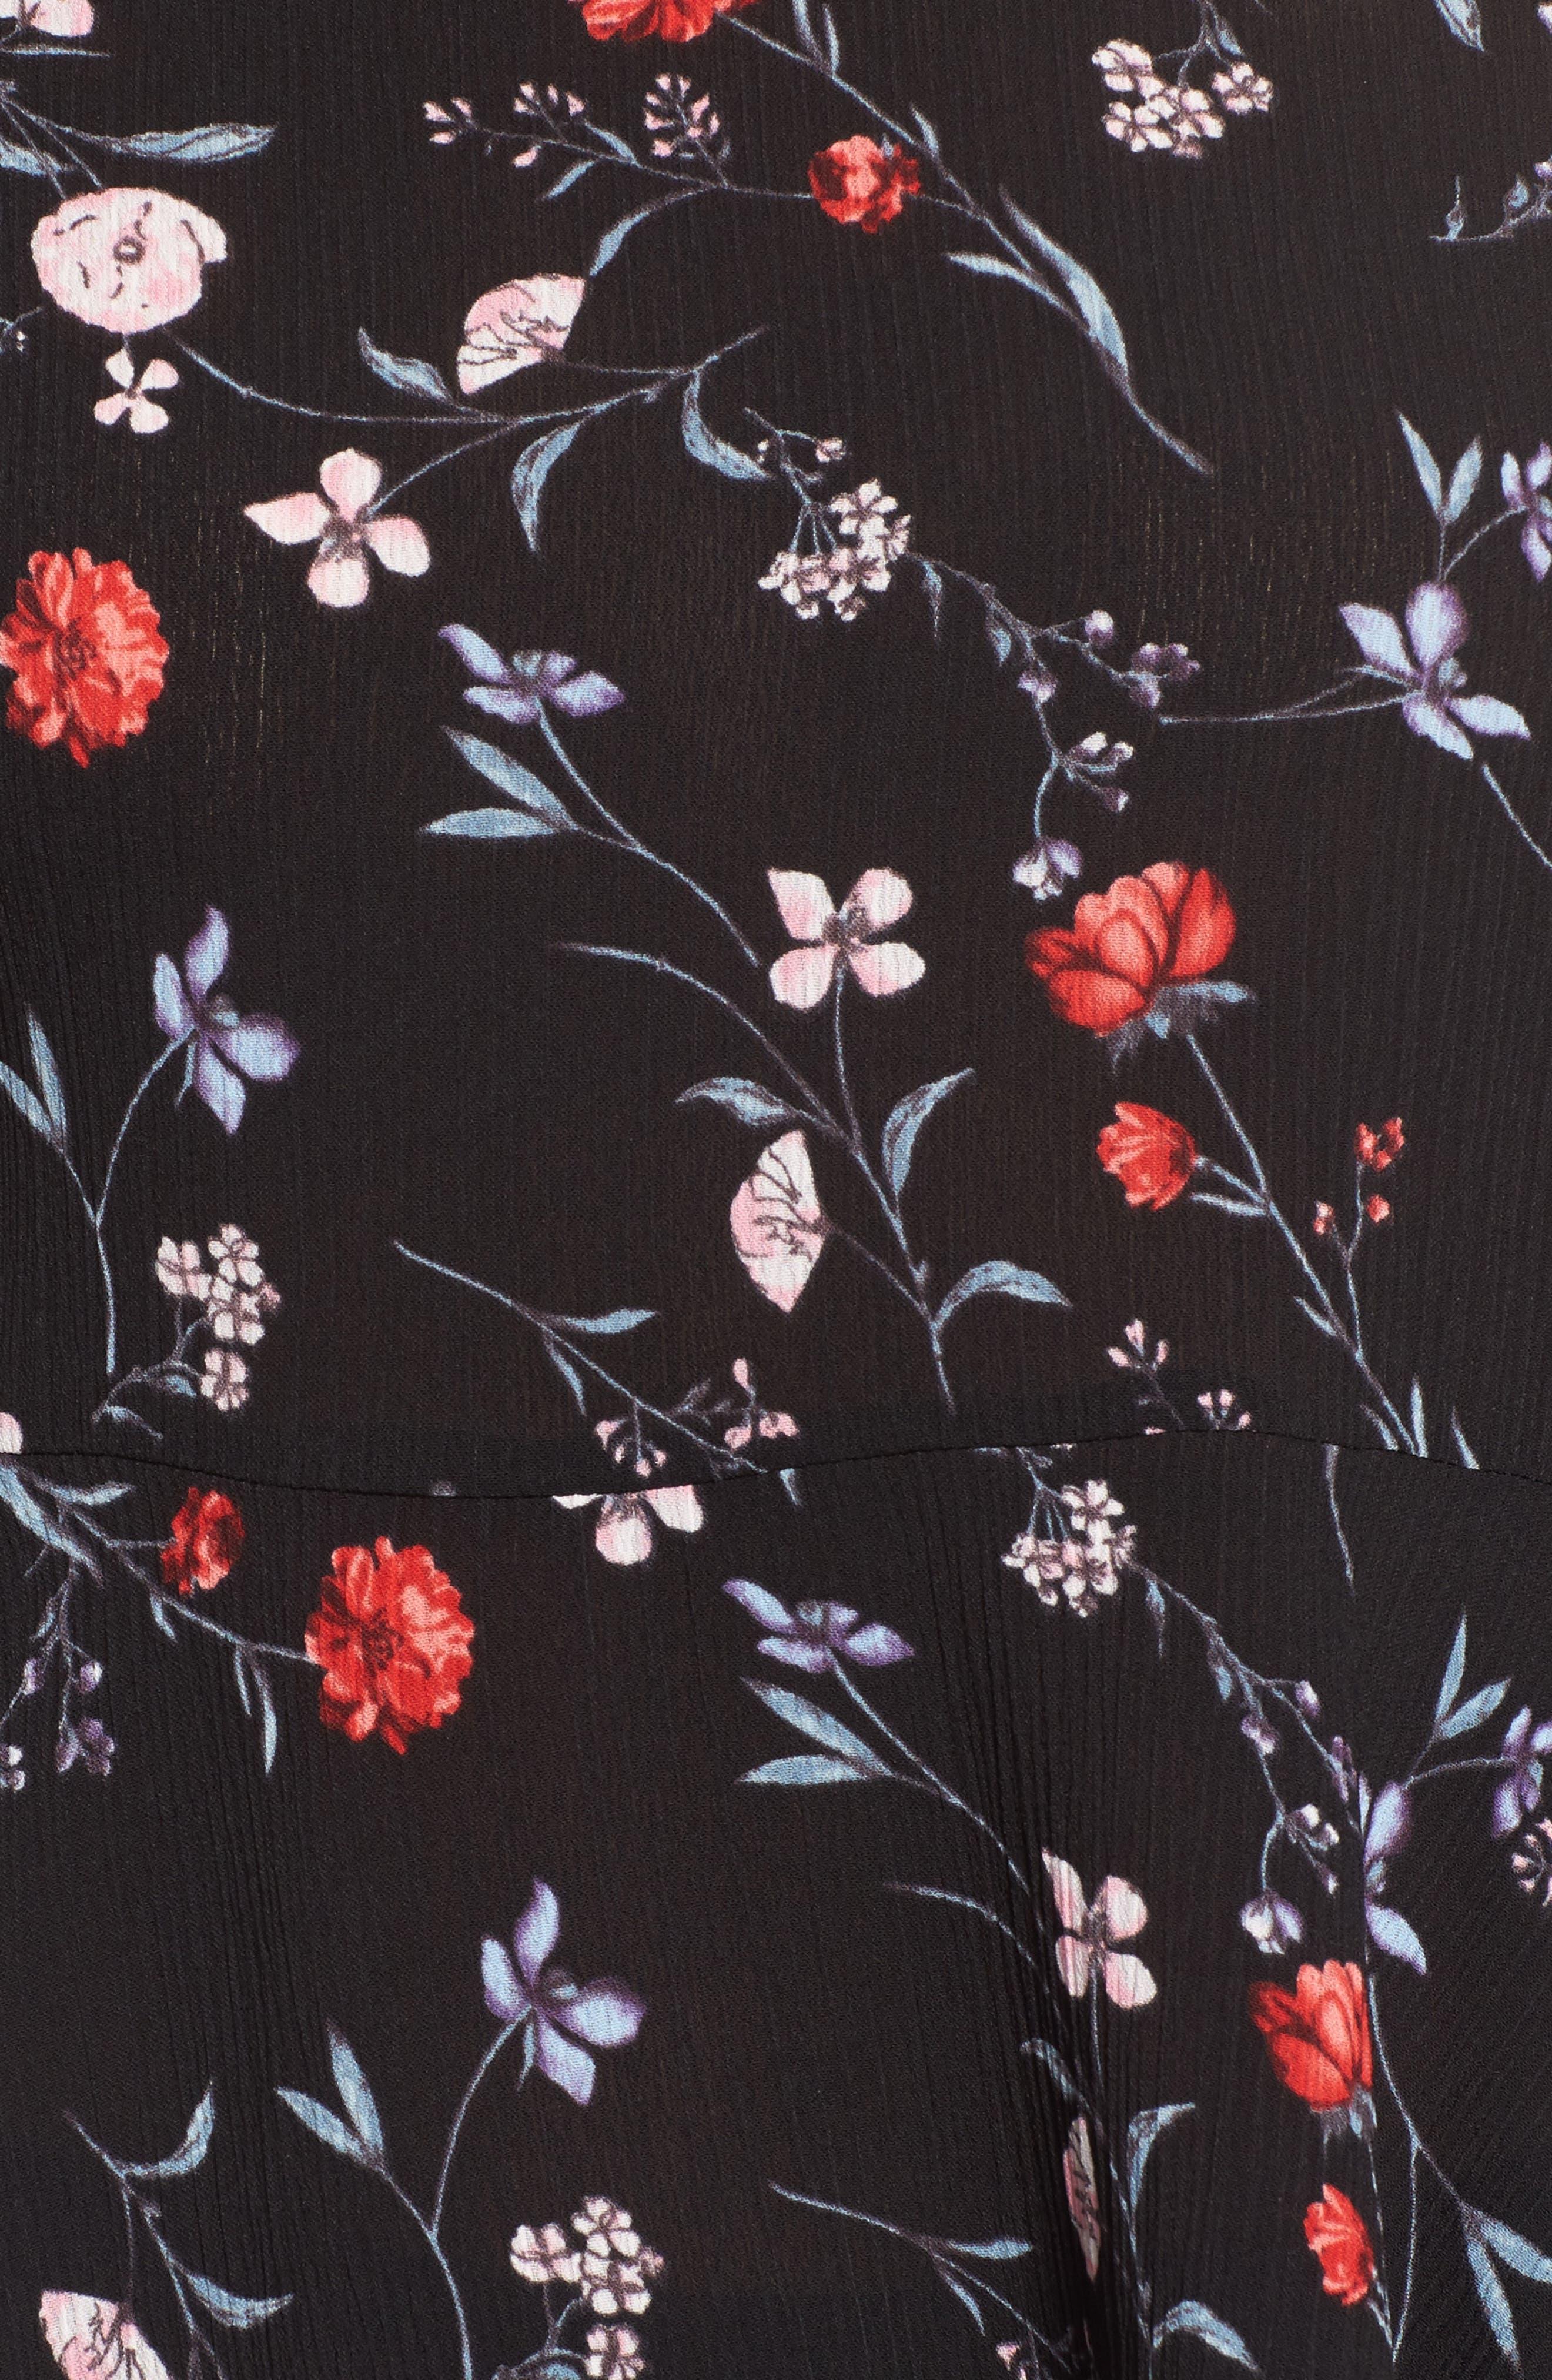 Tiered Ruffle Sleeve Peplum Blouse,                             Alternate thumbnail 5, color,                             Navy Print